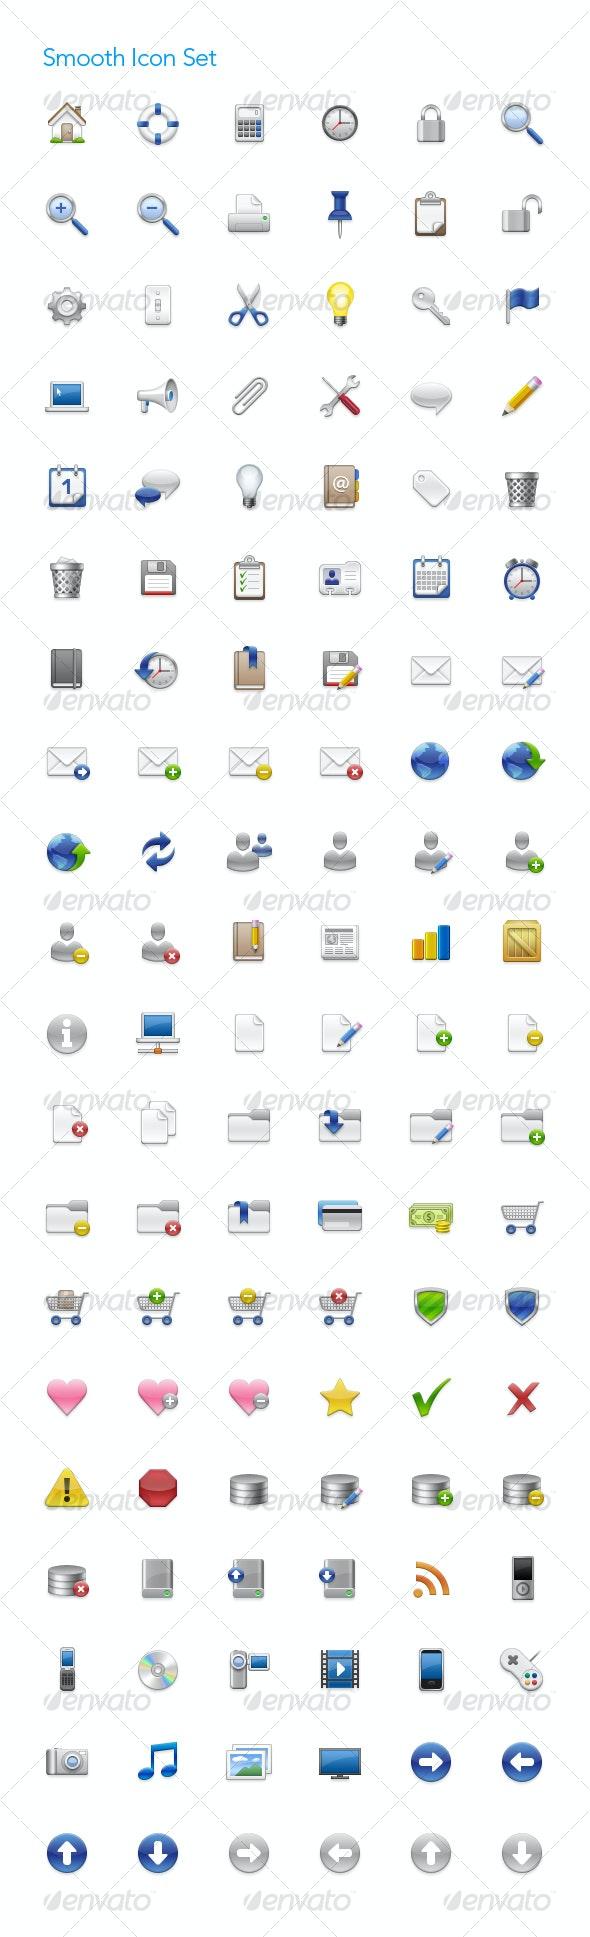 Smooth Icon Set - Web Icons